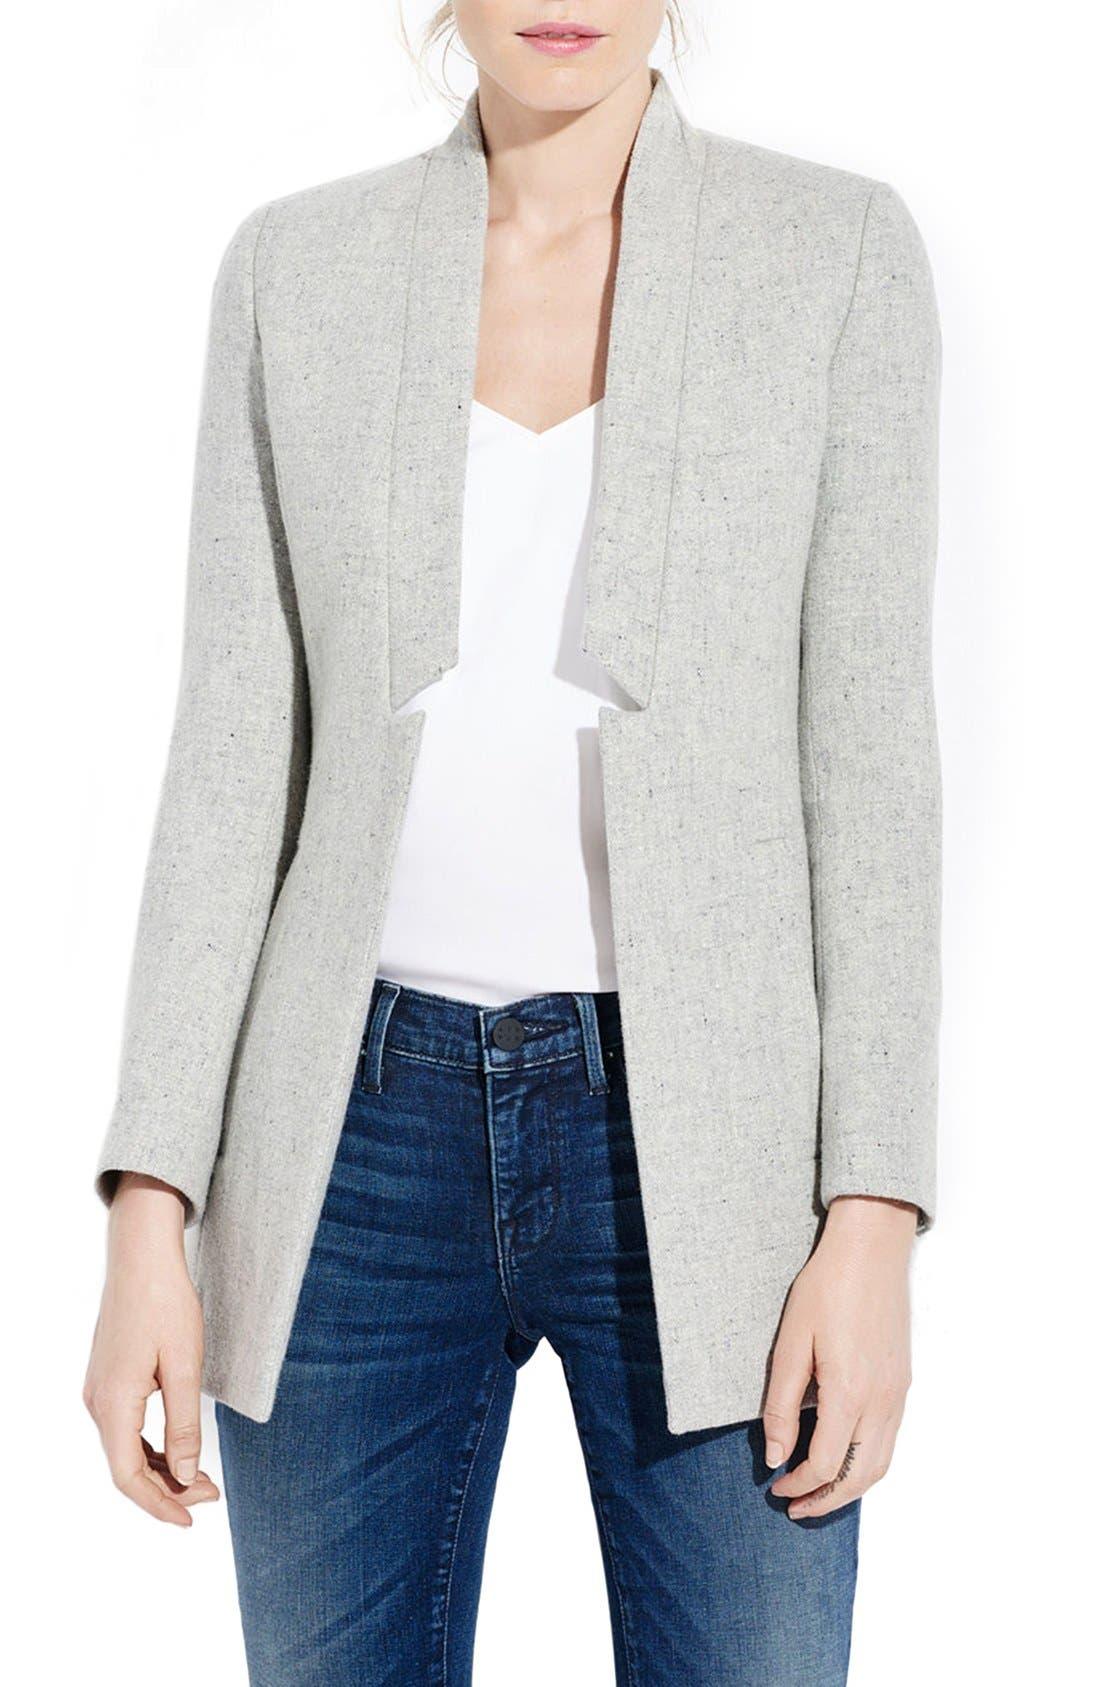 Alternate Image 1 Selected - AYR The Coup Tweed Blazer